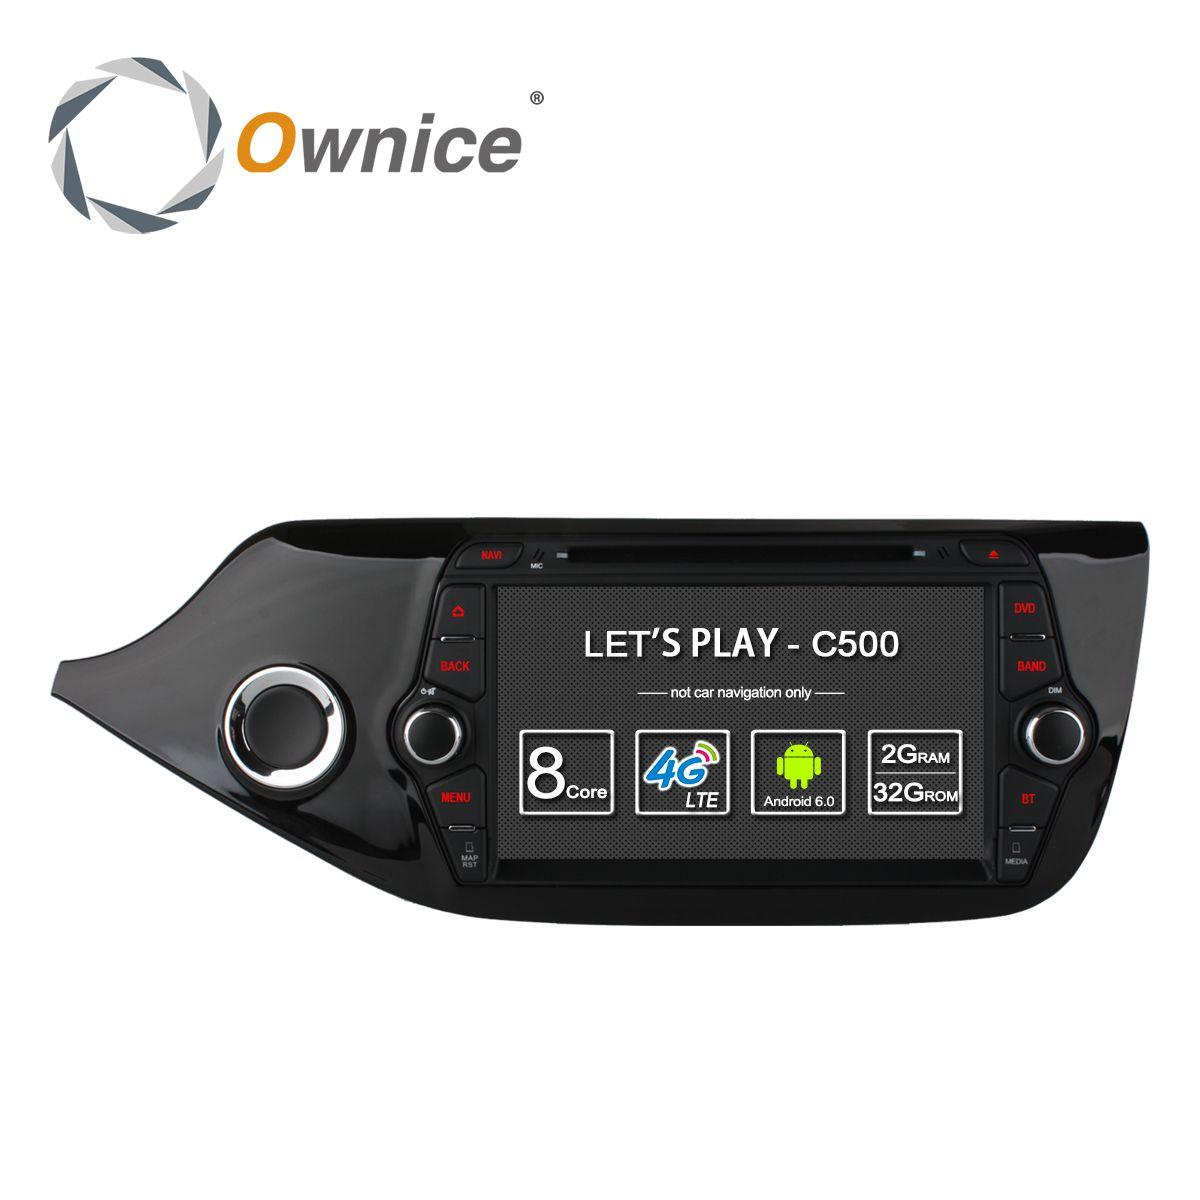 Ownice C500 4G SIM LTE Octa 8 Core Android 6.0 Für Kia CEED 2013-2015 auto Dvd GPS Navi Radio WIFI 4G BT 2 GB RAM 32G ROM